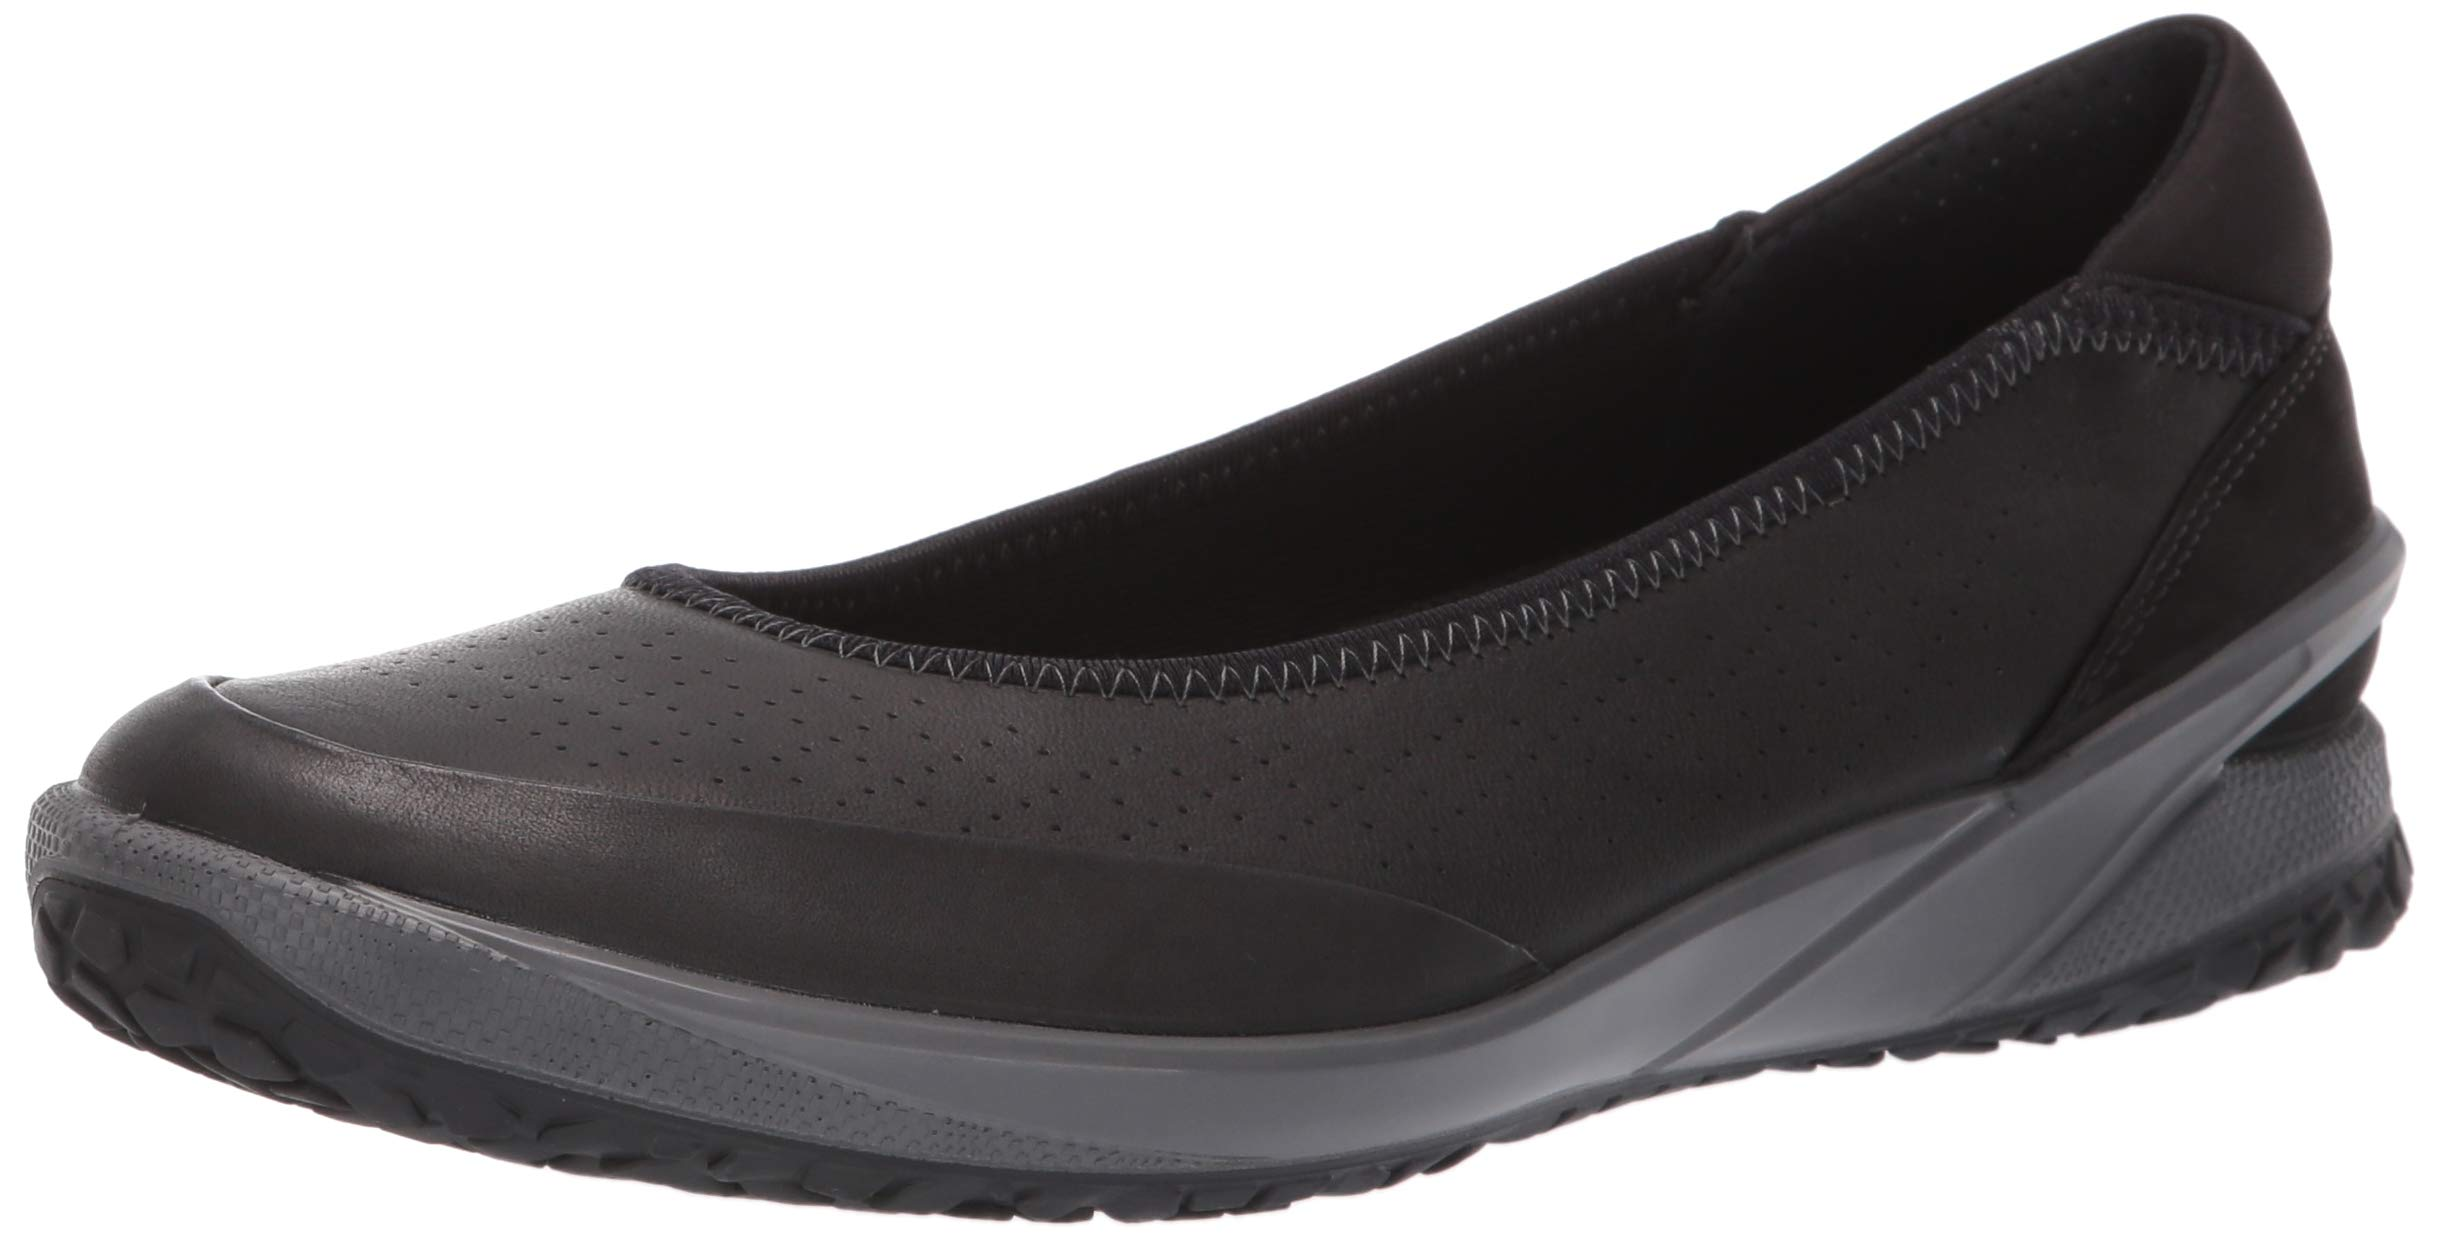 best selling closer at footwear ECCO Women's Biom Life Ballerina Sneaker, Black, 38 M EU (7-7.5 US)